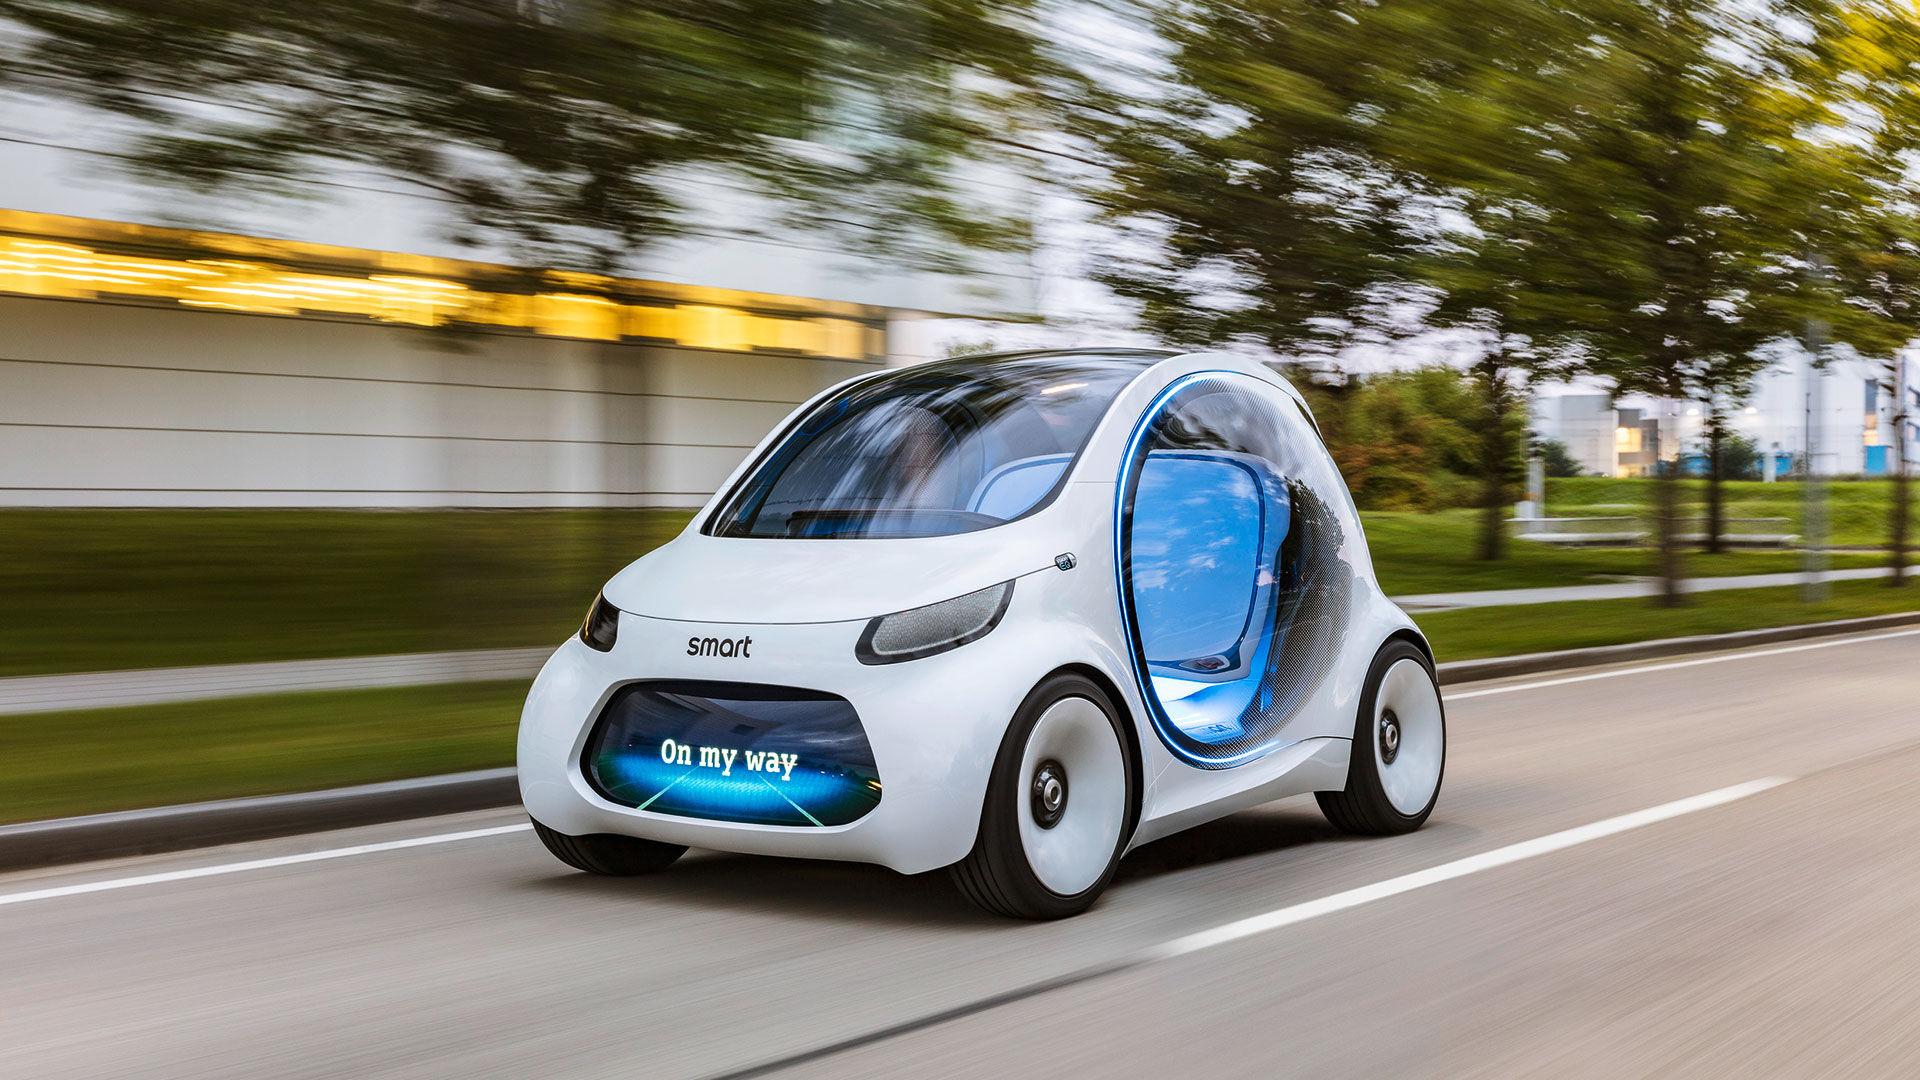 Smart visar upp coolt framtidskoncept